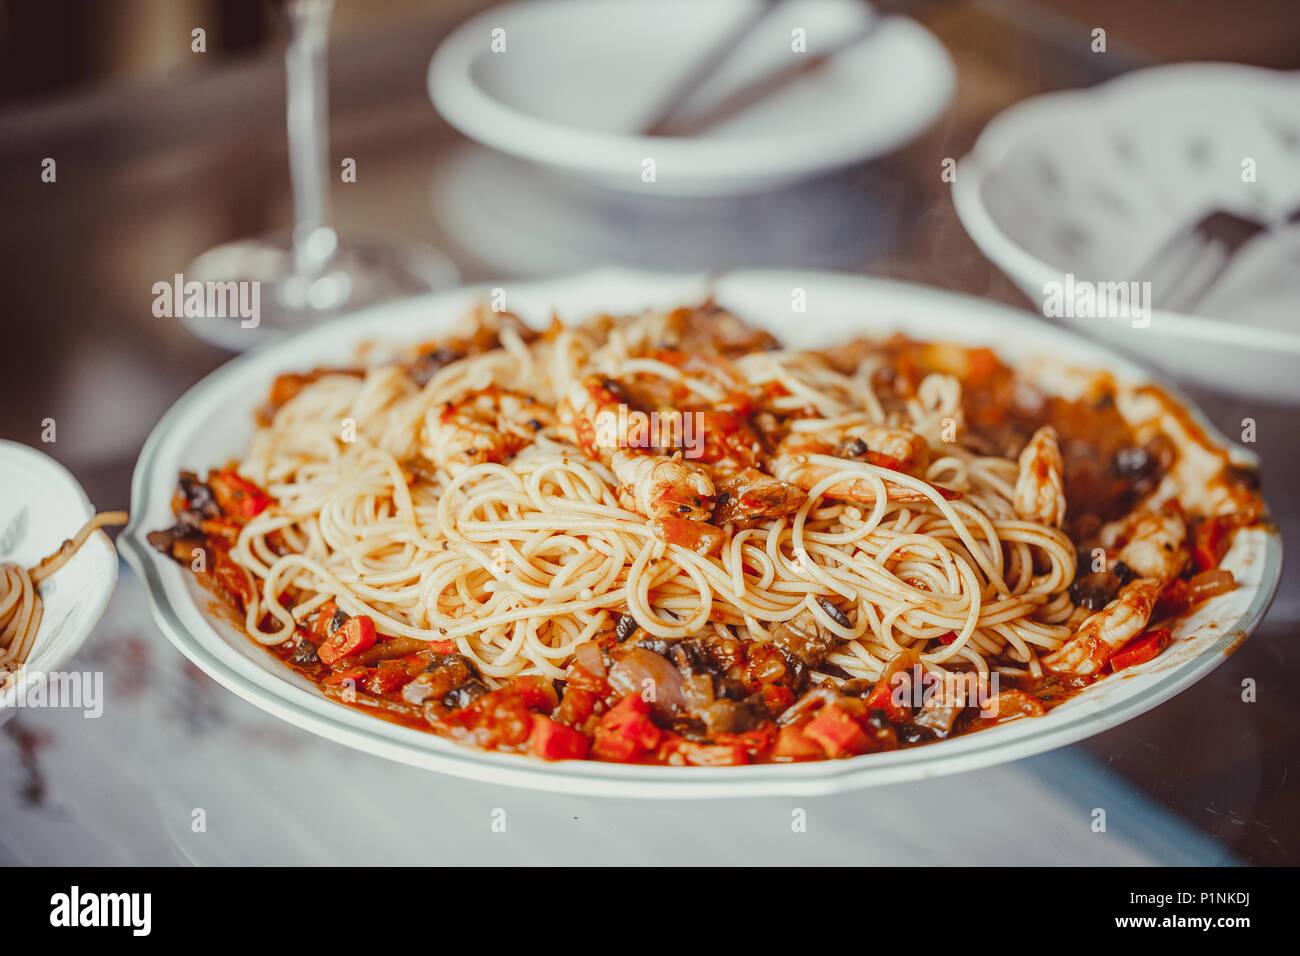 Angel Hair Pasta With Tomato Sauce Garlic And Shrimp Stock Photo